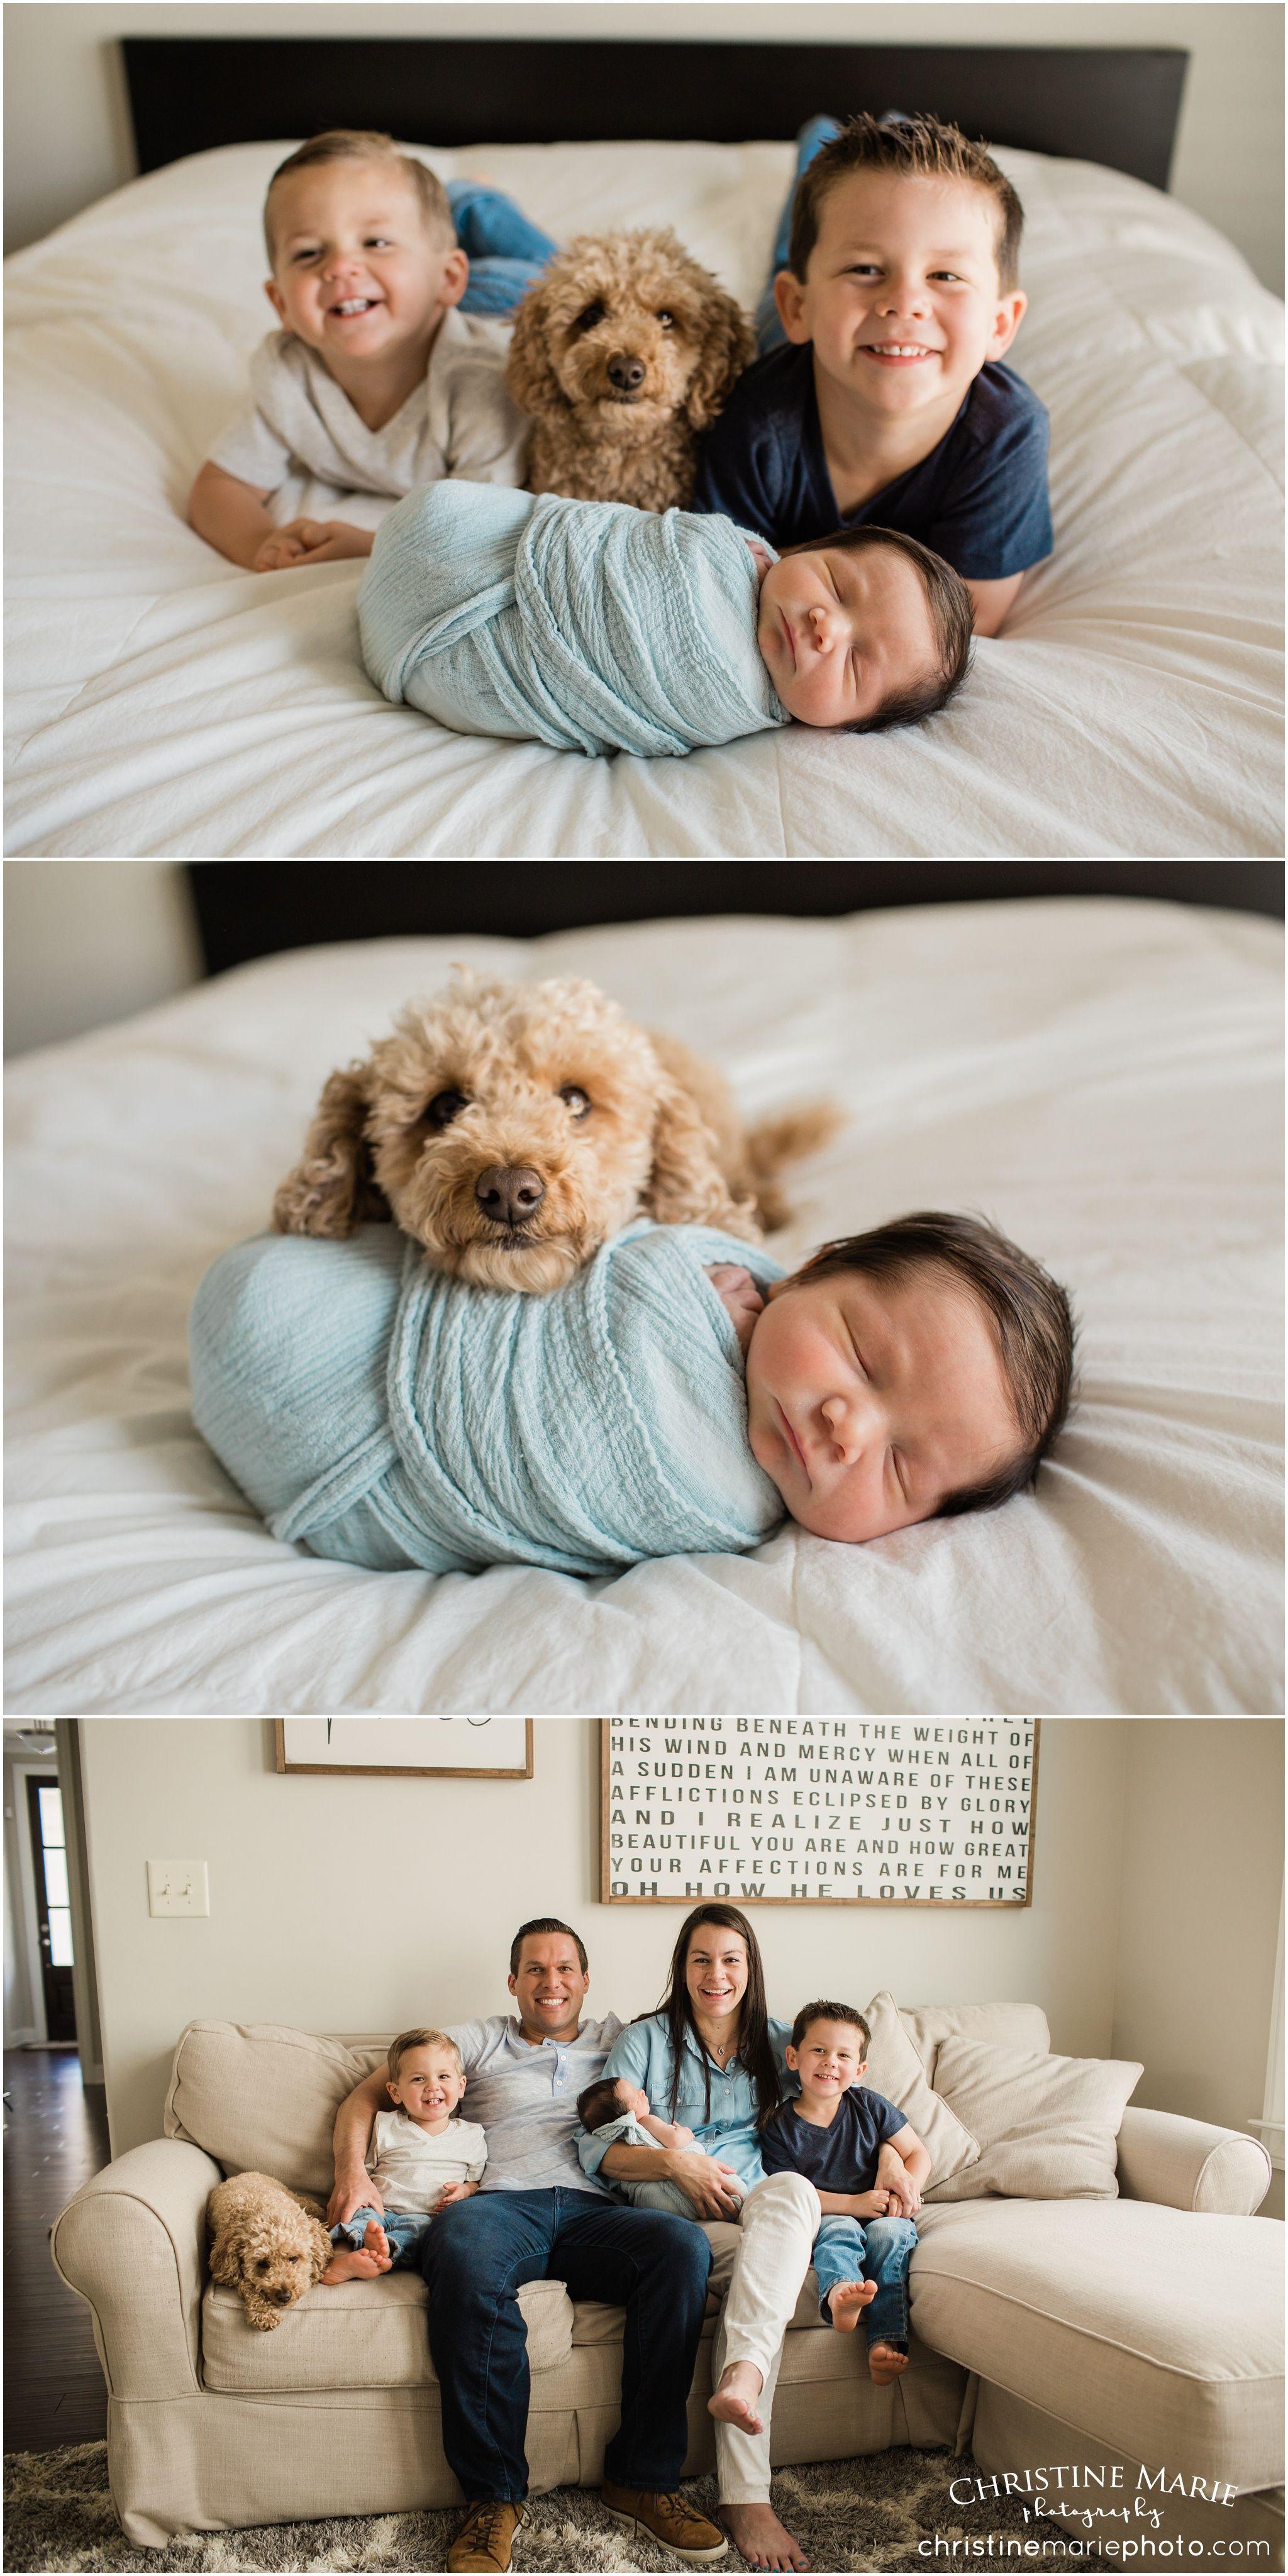 Lifestyle newborn photography lifestyle newborn session newborn with siblings newborn with dog newborn with dog ideas newborn with dog photos